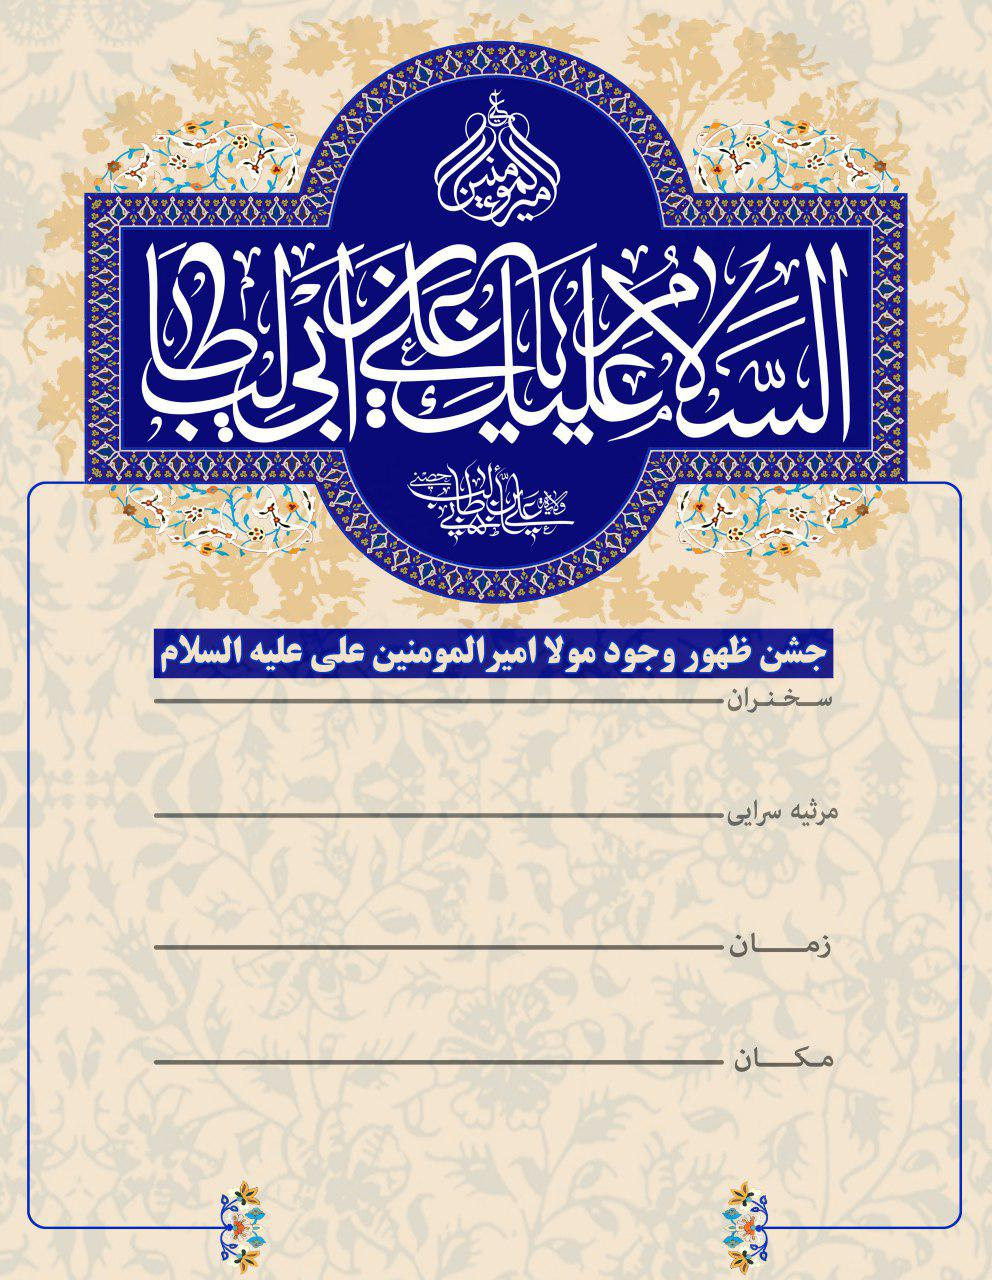 traket kham veladate imamali 1 - تراکت خام ولادت امام علی(ع)